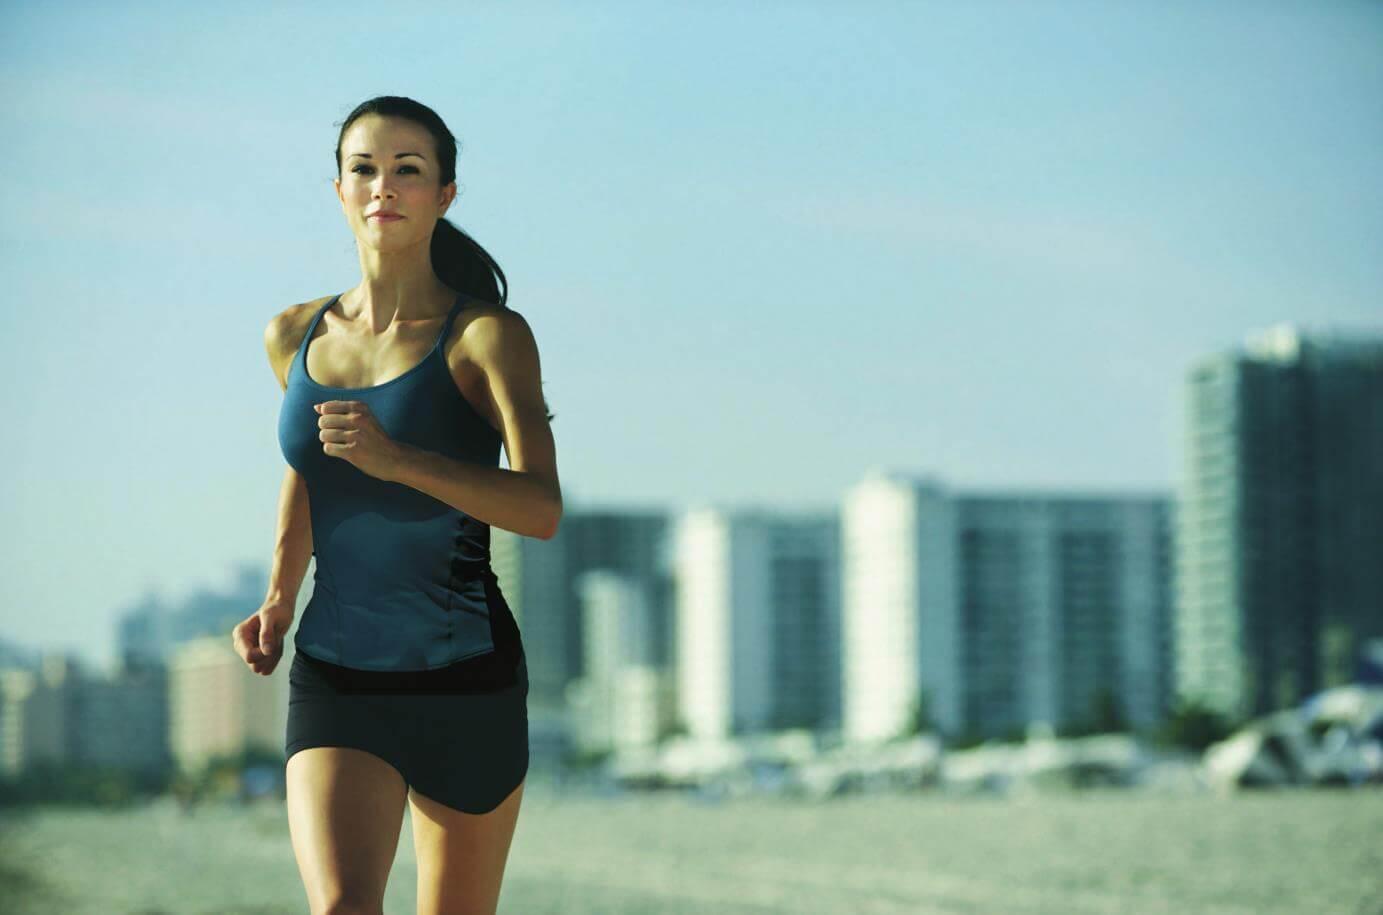 вреден ли бег для позвоночника